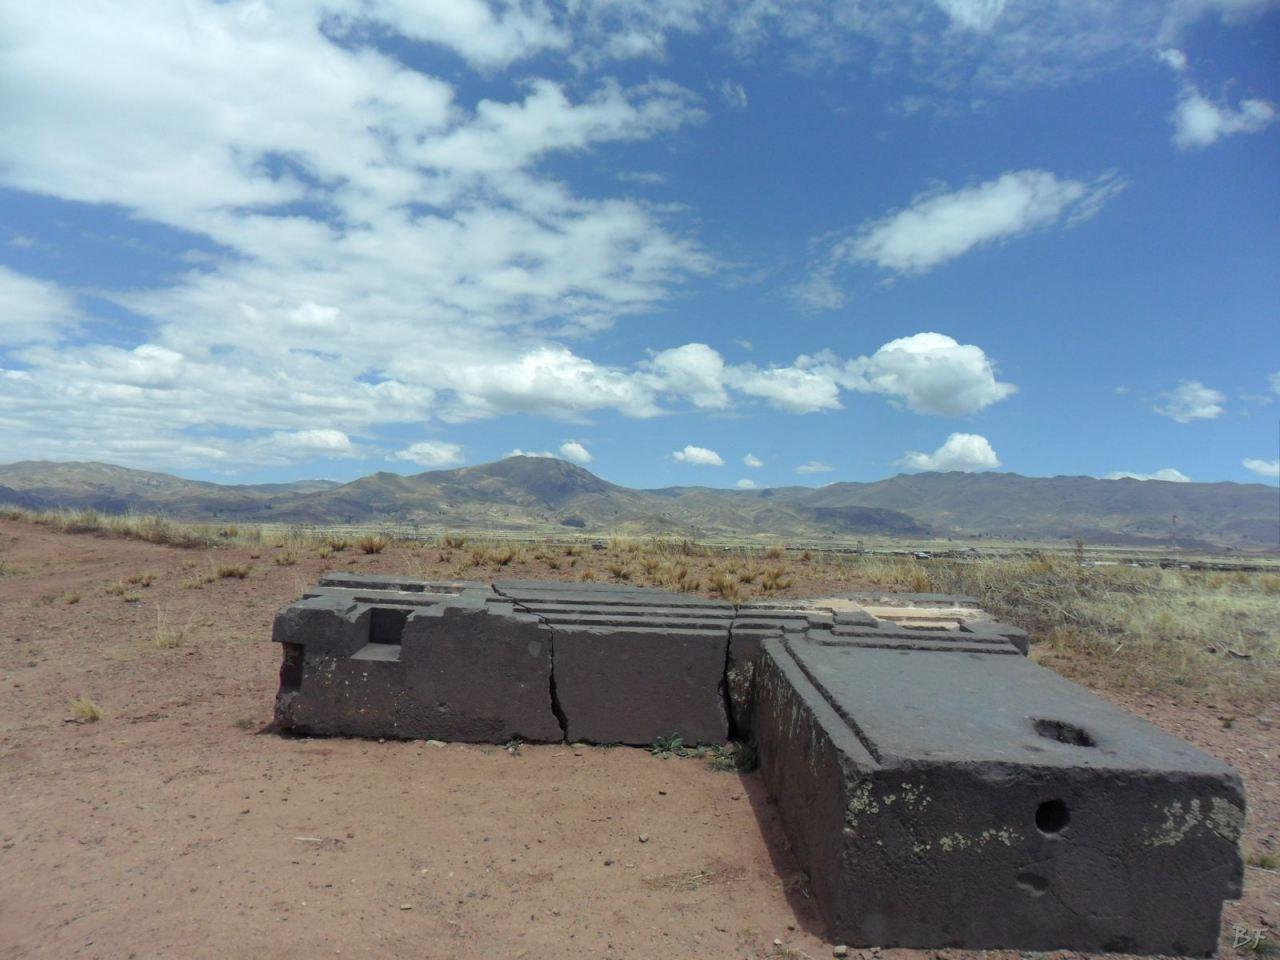 Sito-Megalitico-Piramide-Akapana-Kalasasaya-Menhir-Tiahuanaco-Bolivia-137